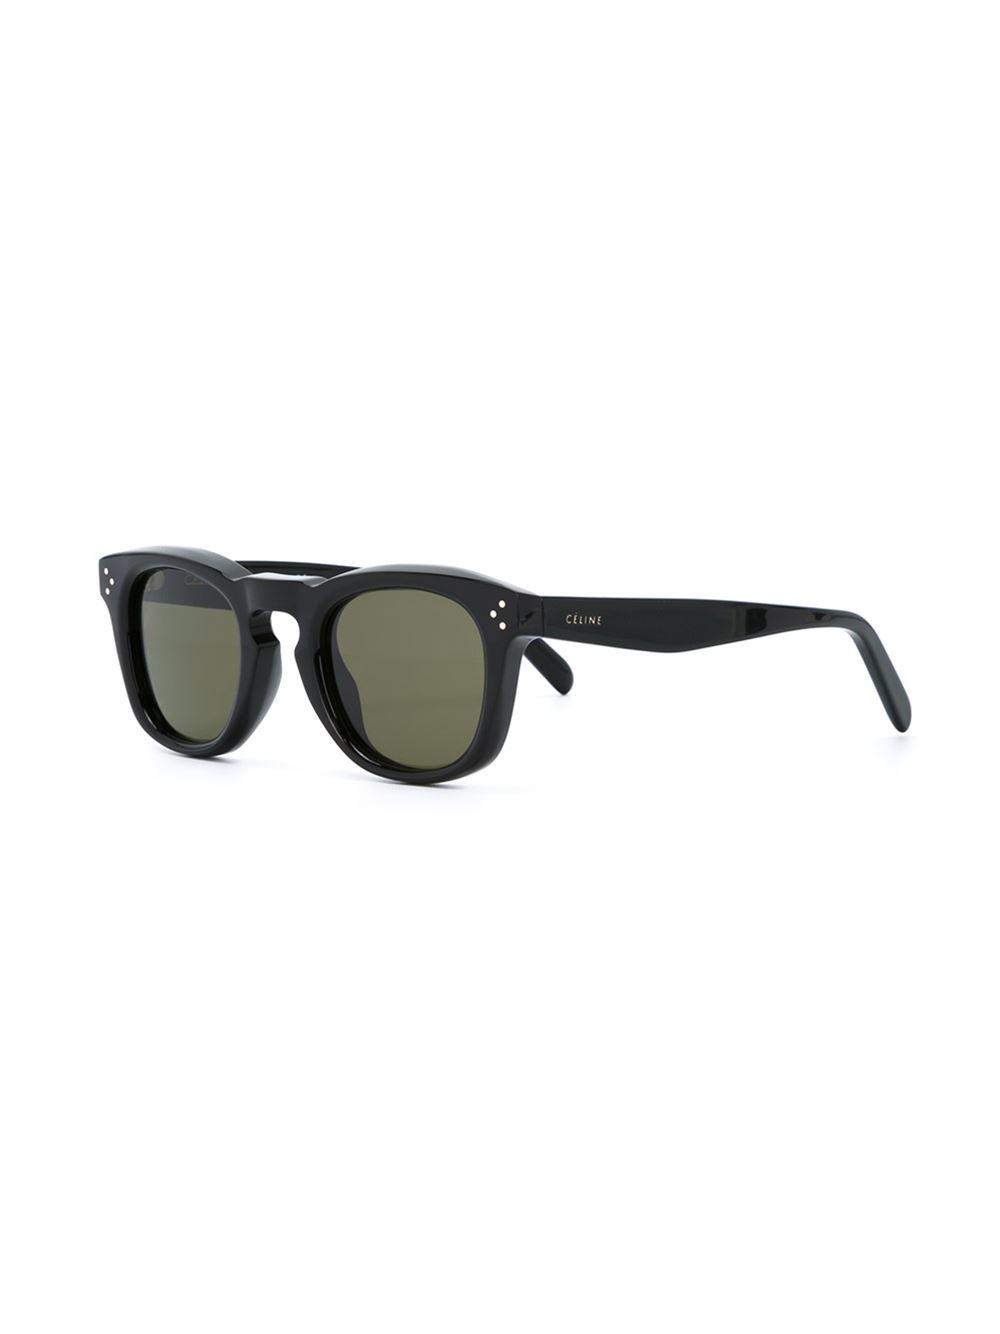 d1a0b60d874ec Céline  bevel Square  Sunglasses in Black - Lyst